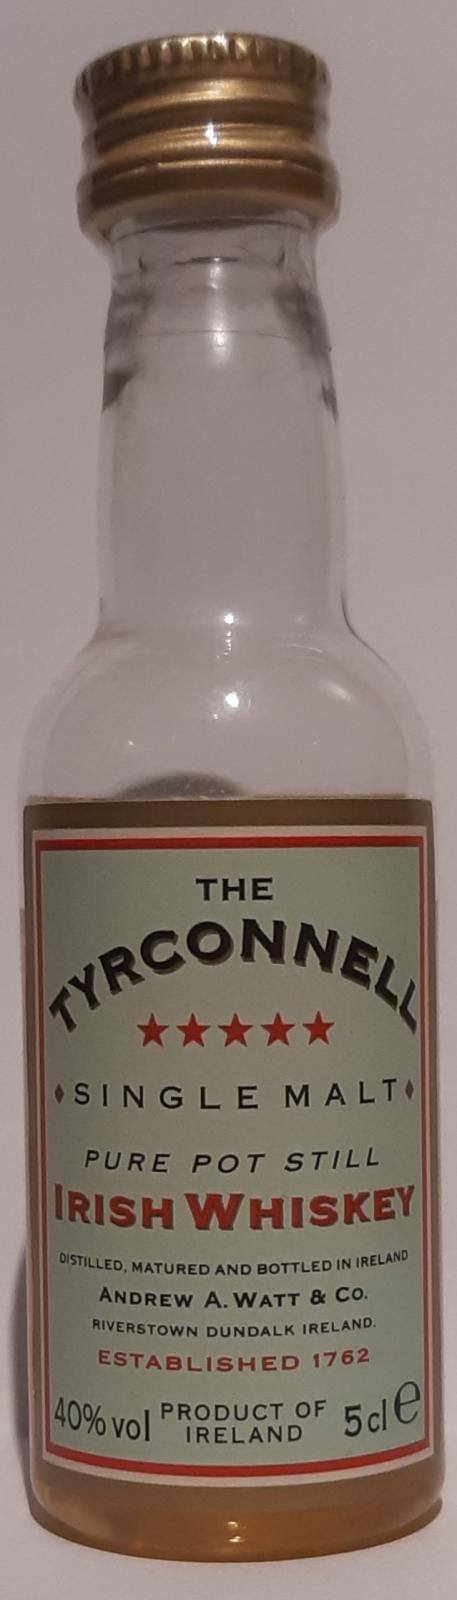 Tyrconnell Single Malt - Pure Pot Still